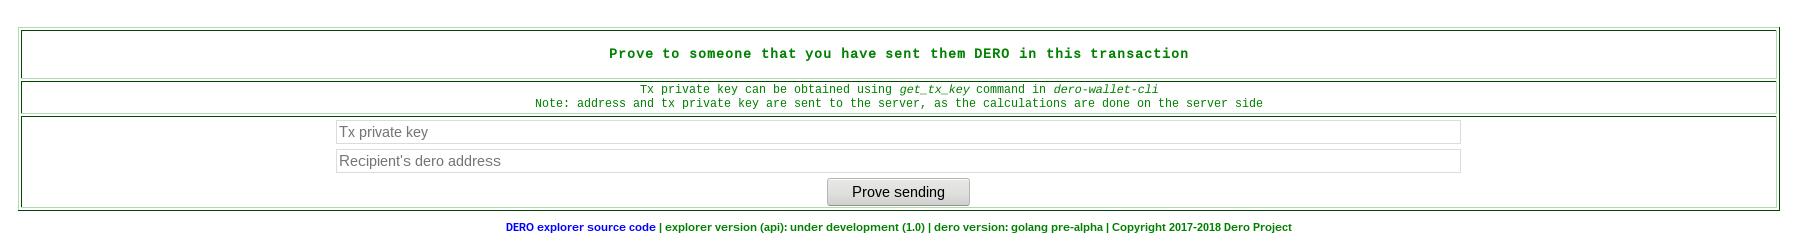 DERO Explorer Proving Transaction